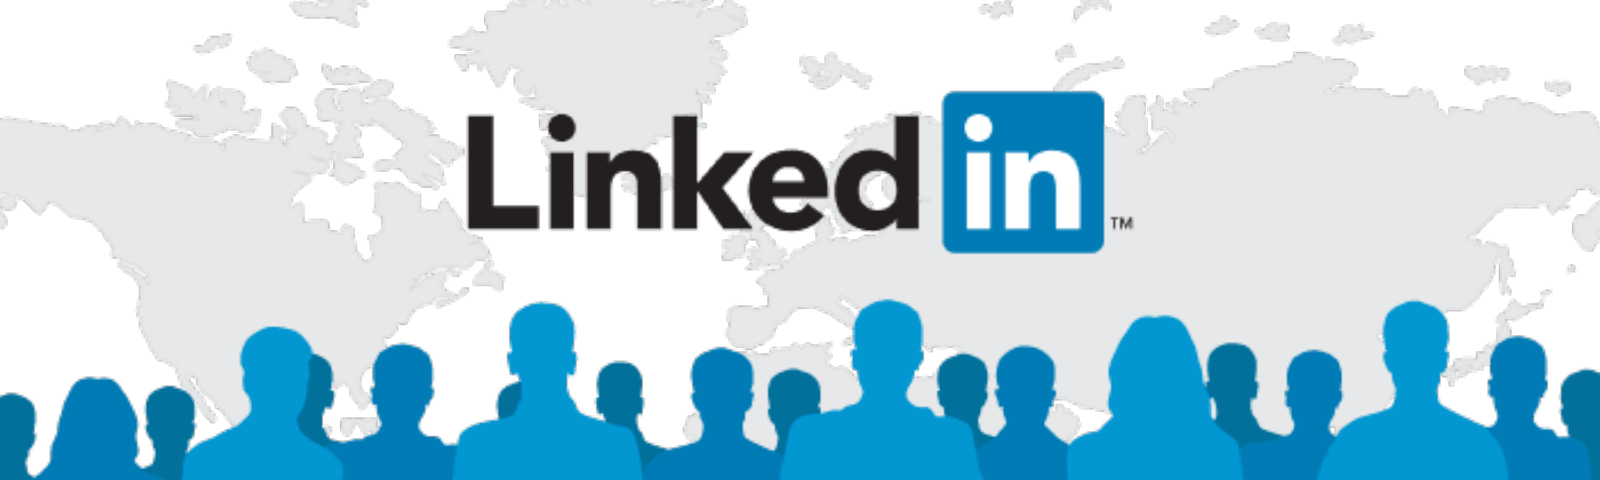 Продвижение в linkedin. Linkedin Followers. Linkedin друзья.